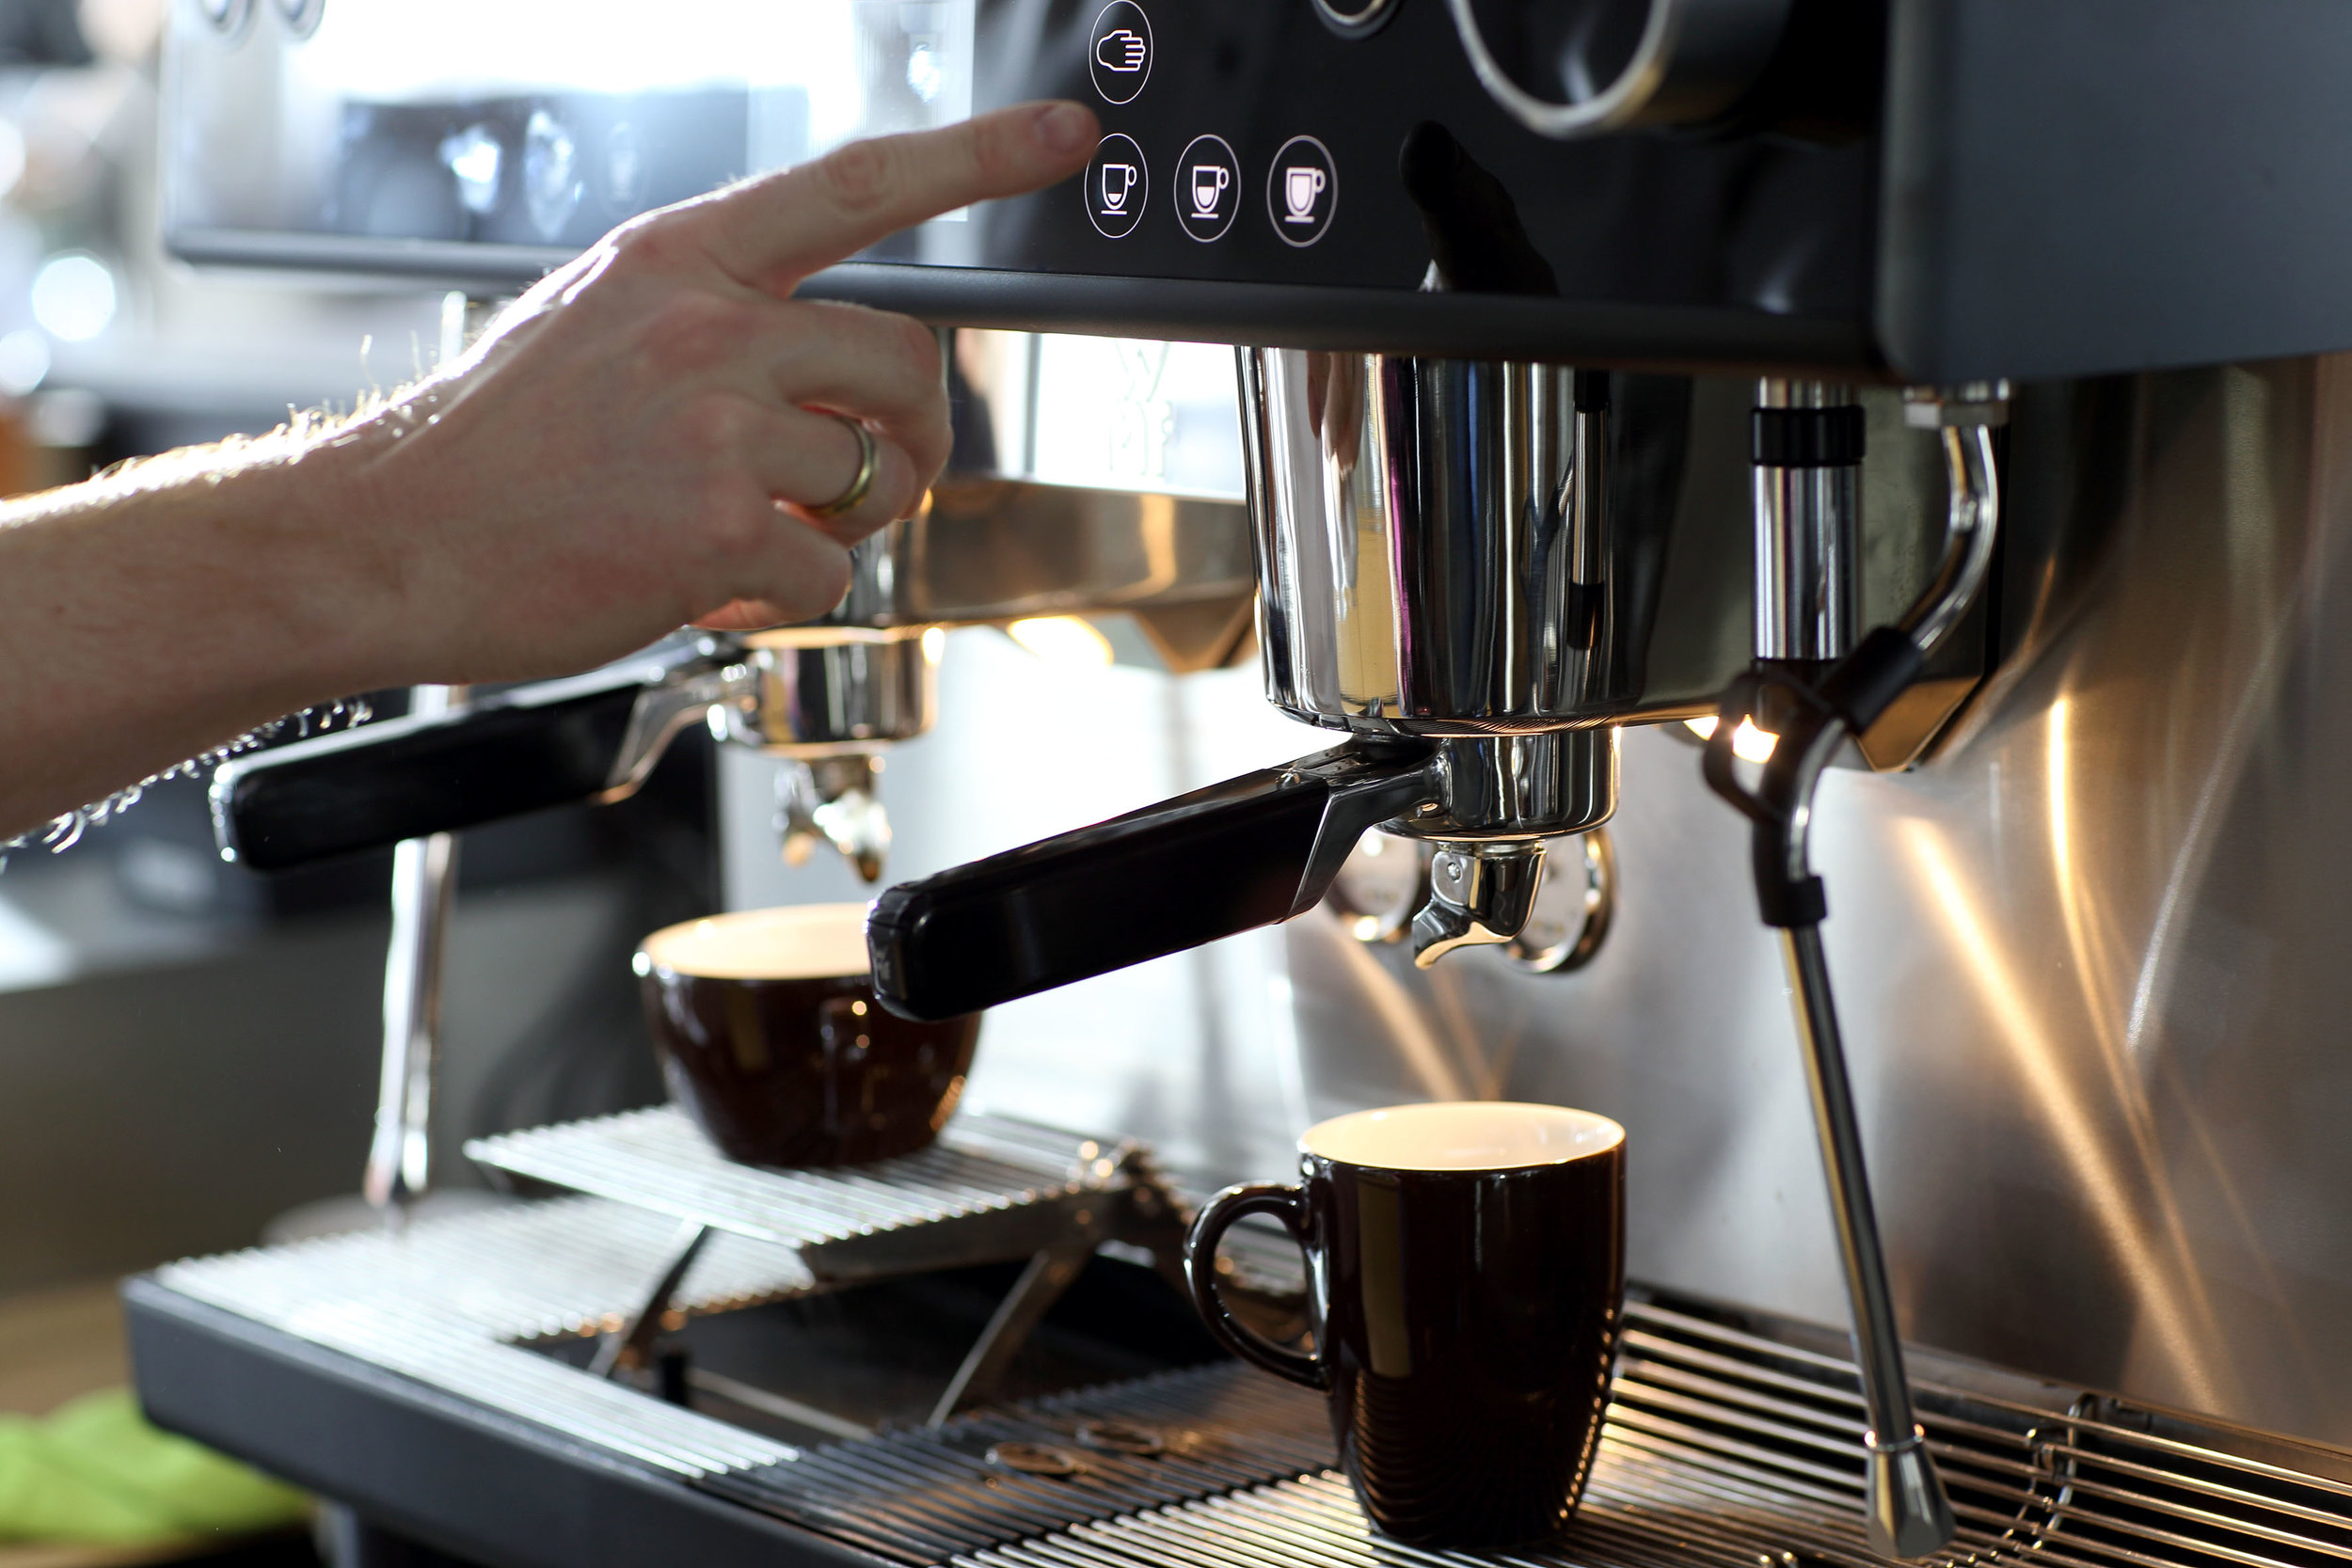 2015_WMF_espresso_Presse_01.jpg